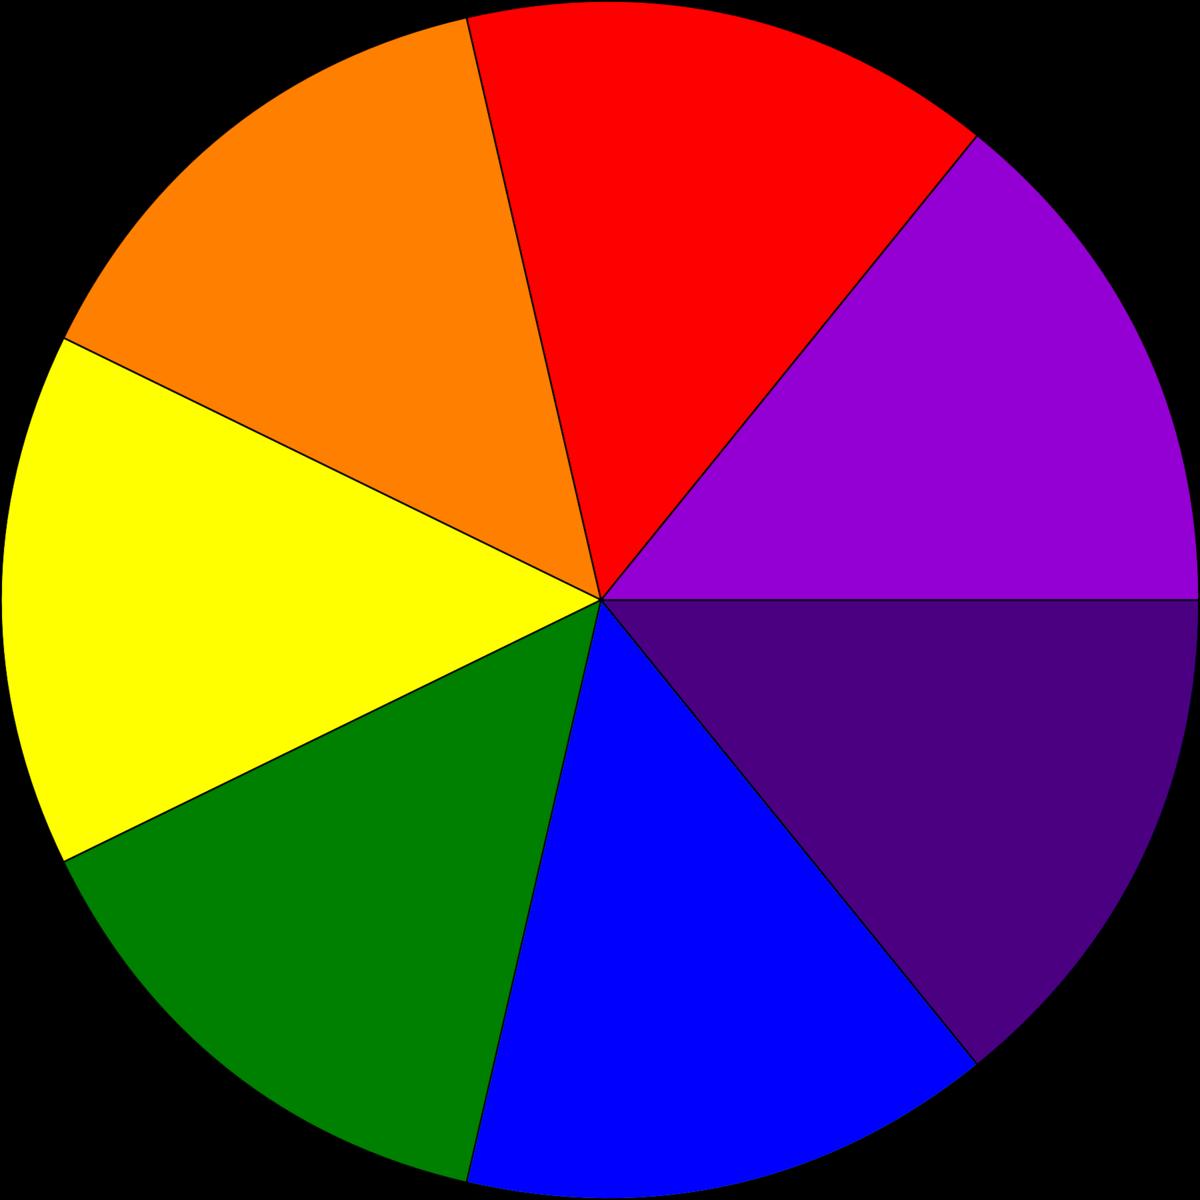 Extrêmement Disco di Newton - Wikipedia NK23